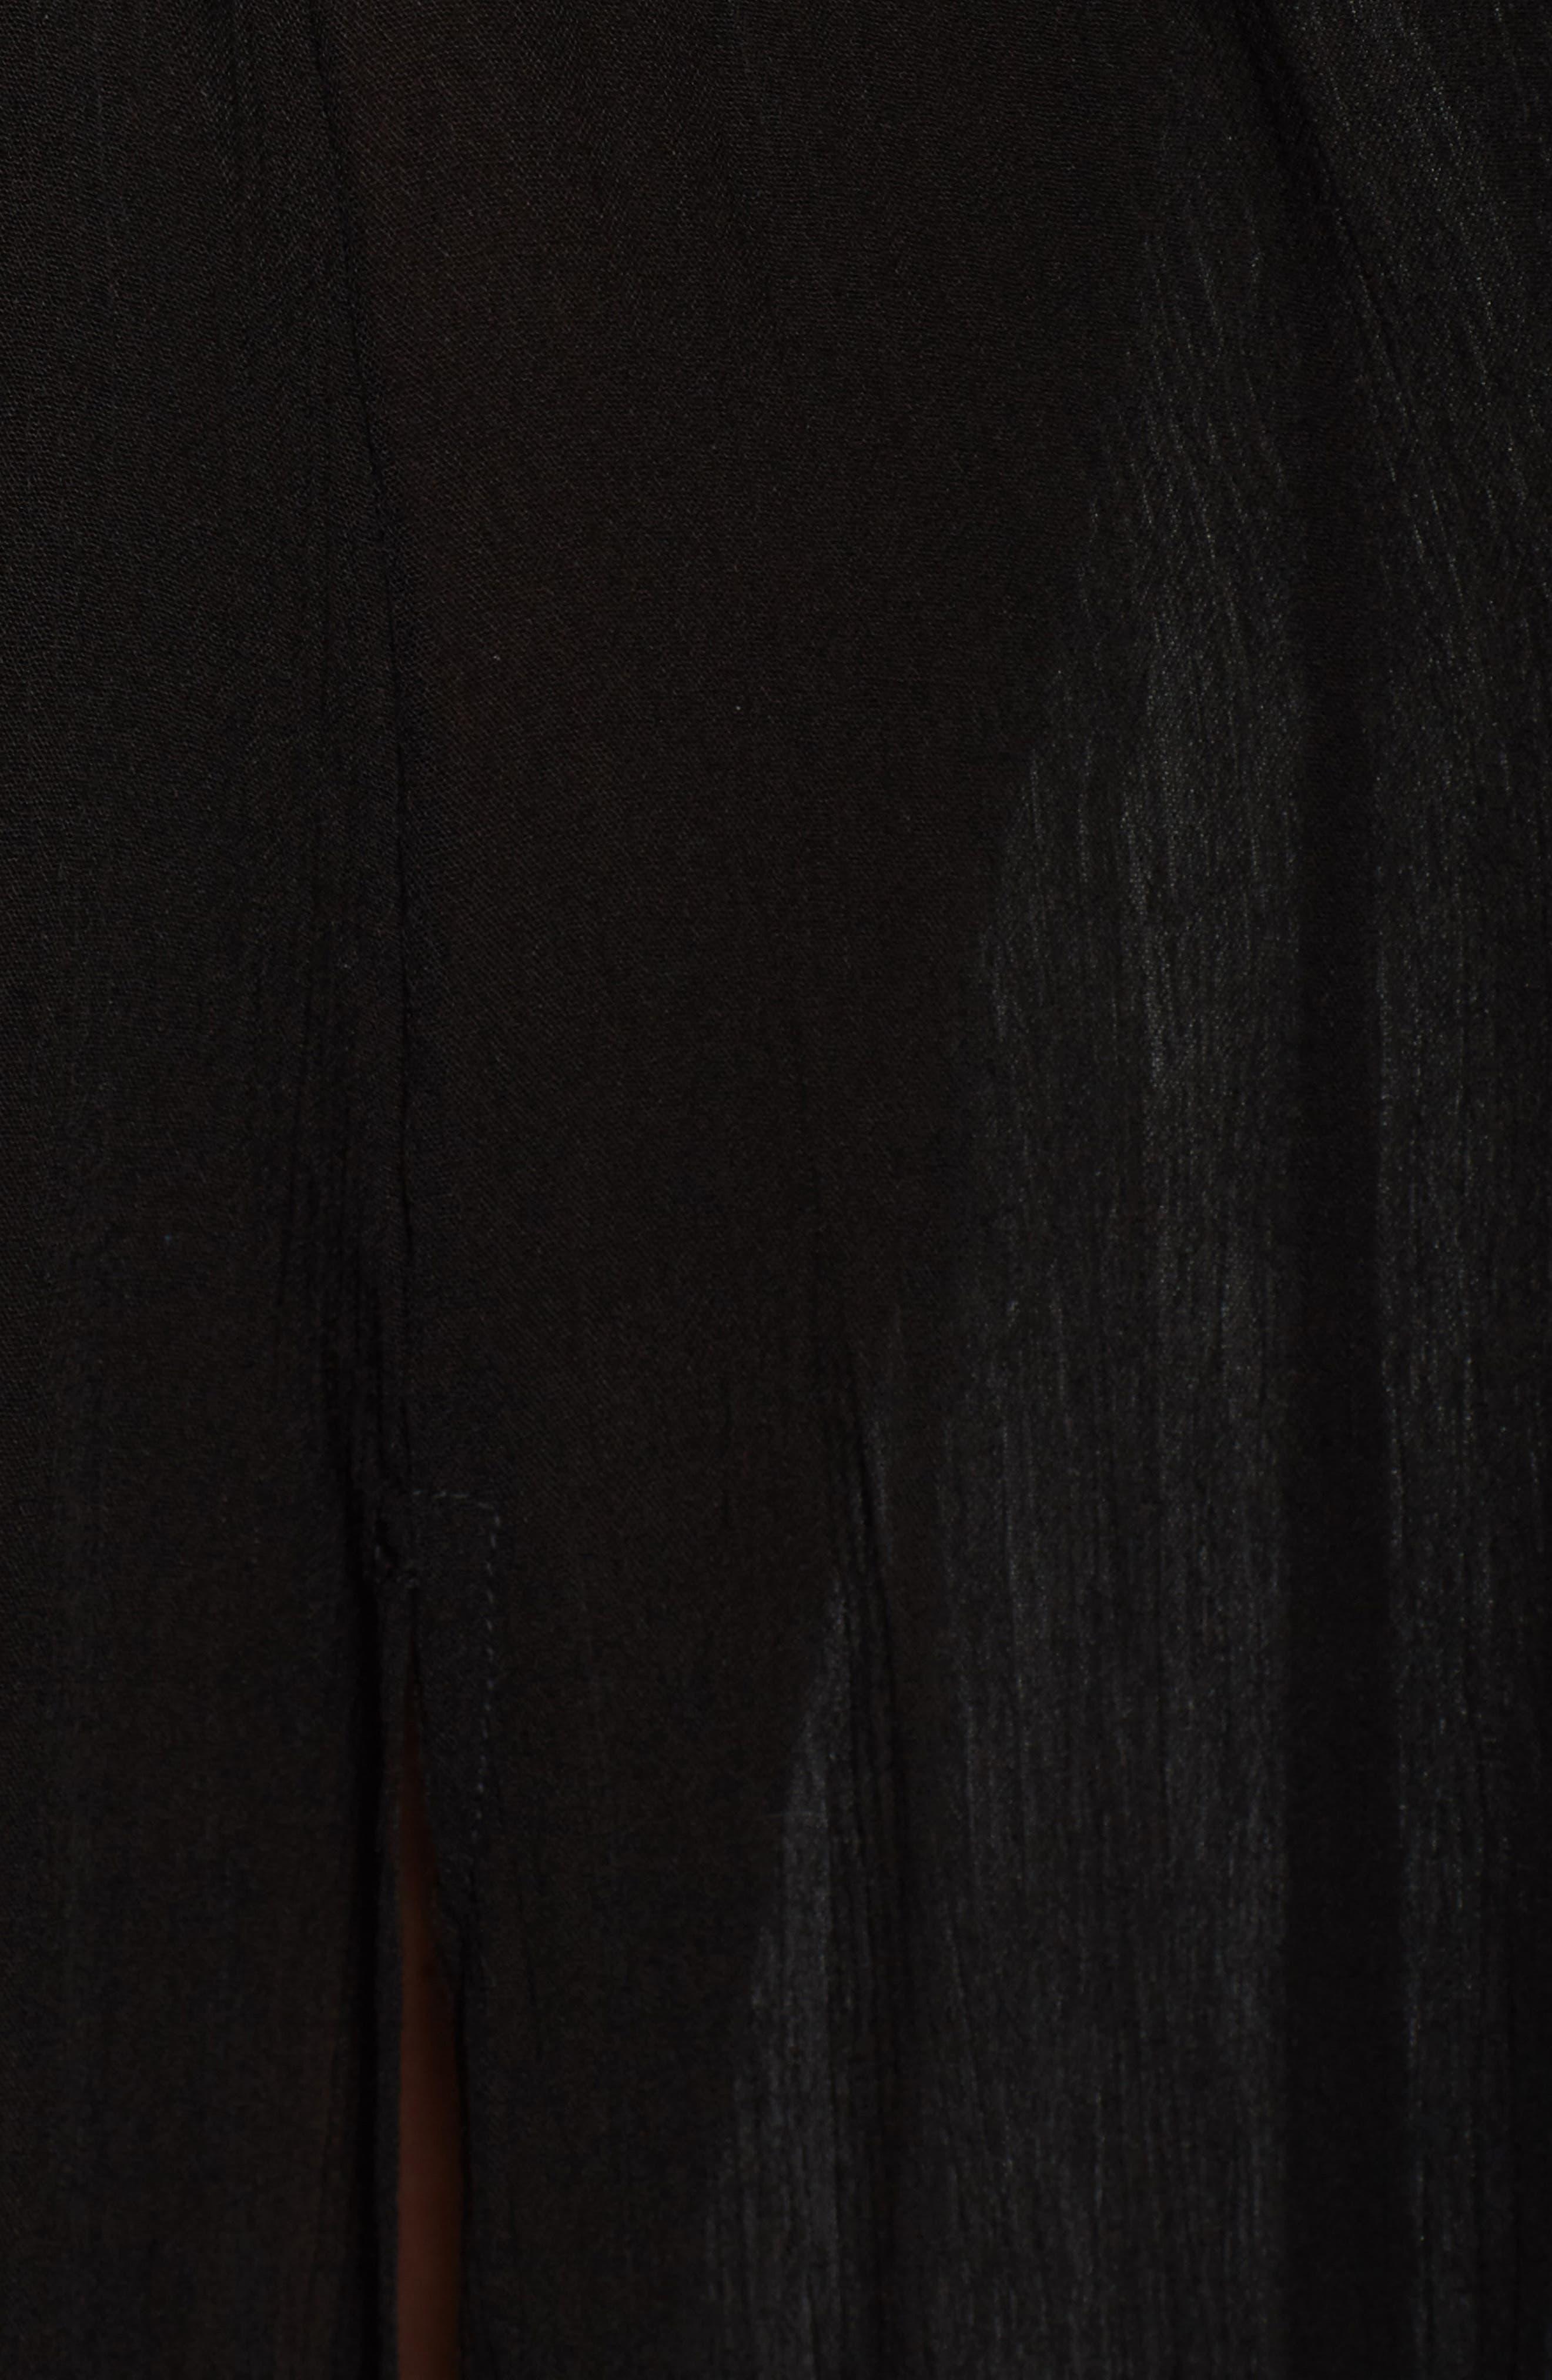 Cutout Maxi Cover-Up Dress,                             Alternate thumbnail 5, color,                             Black